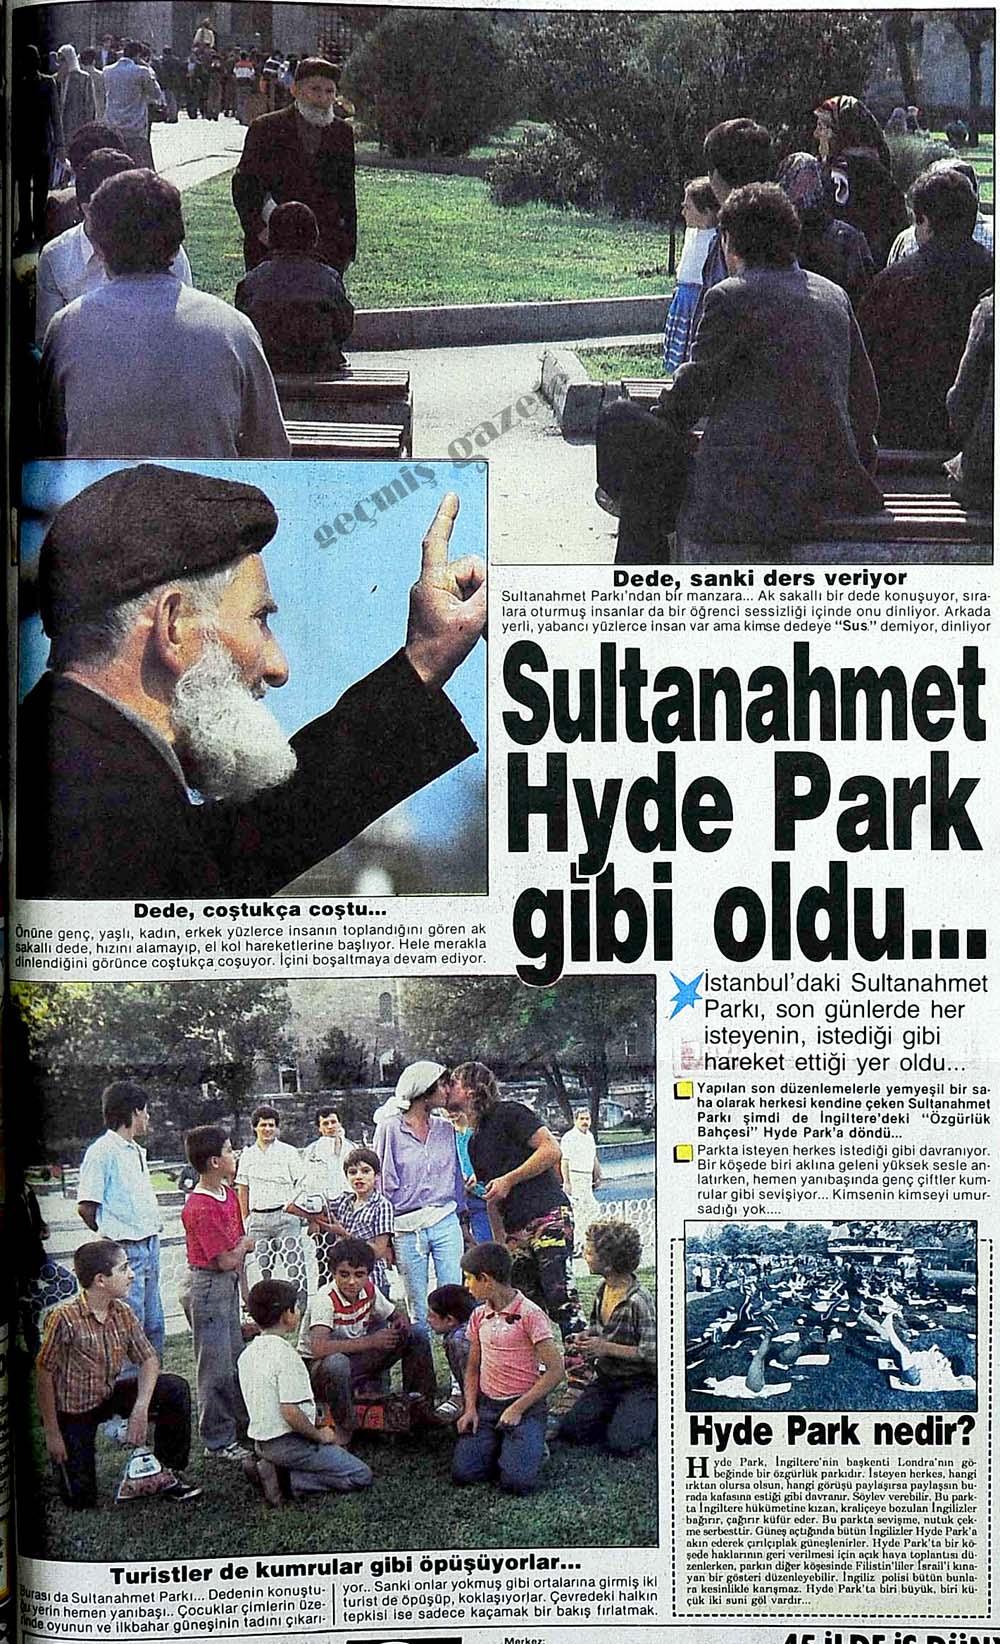 Sultanahmet Hyde Park gibi oldu...